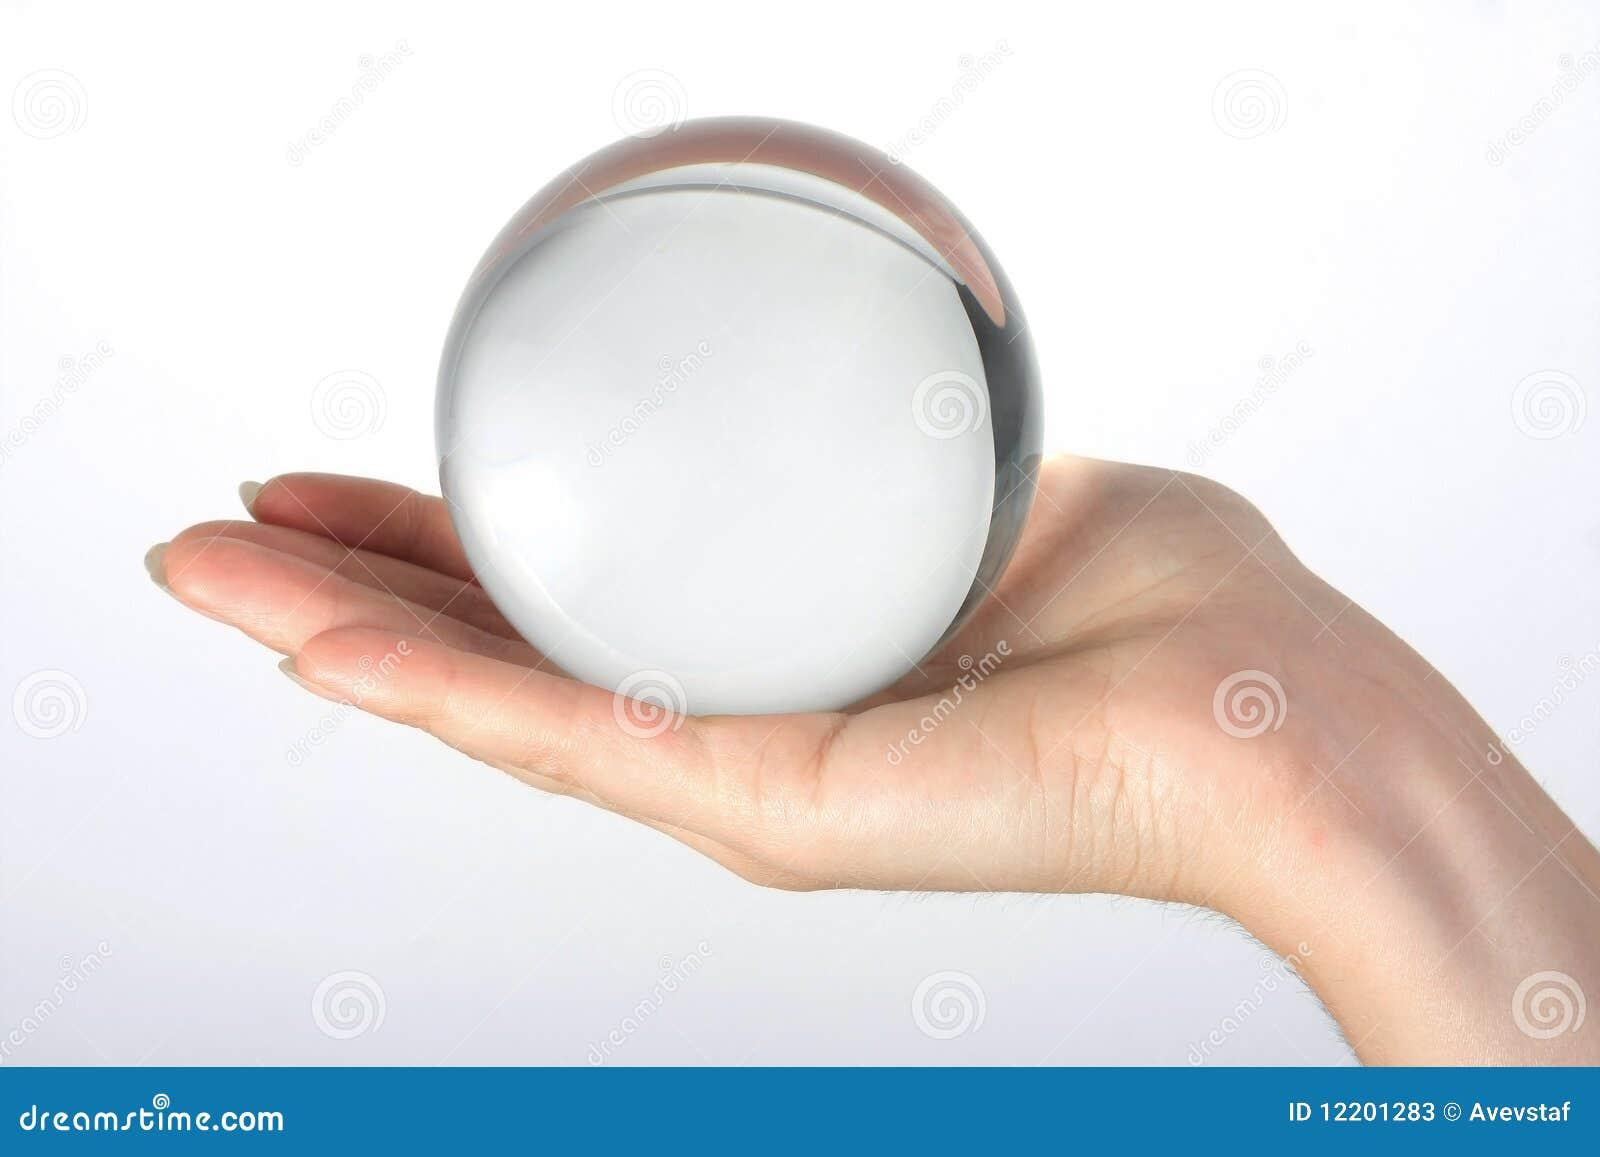 Die transparente Glaskugel